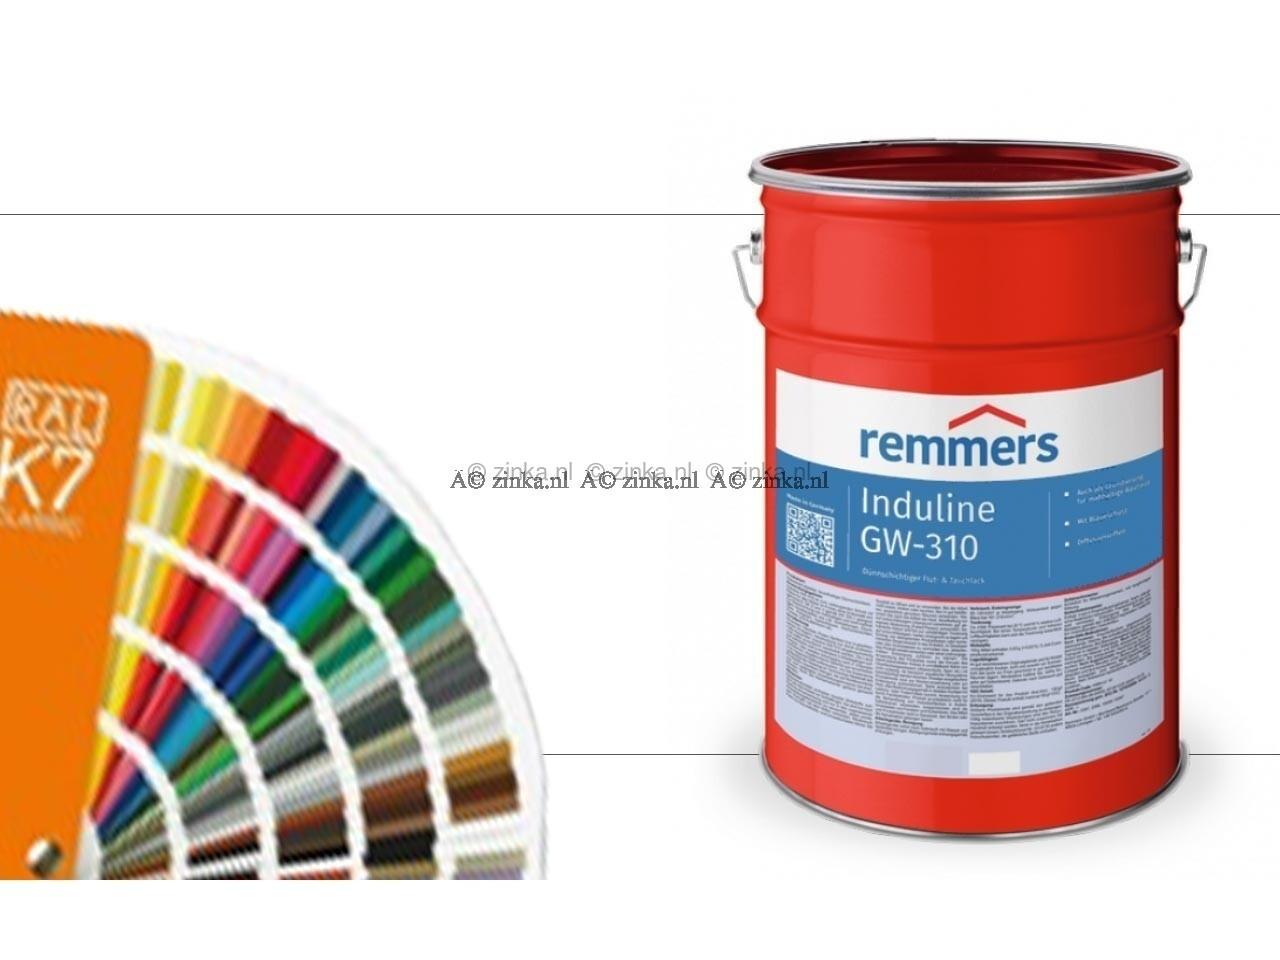 Induline GW-310 RAL-kleuren transparant